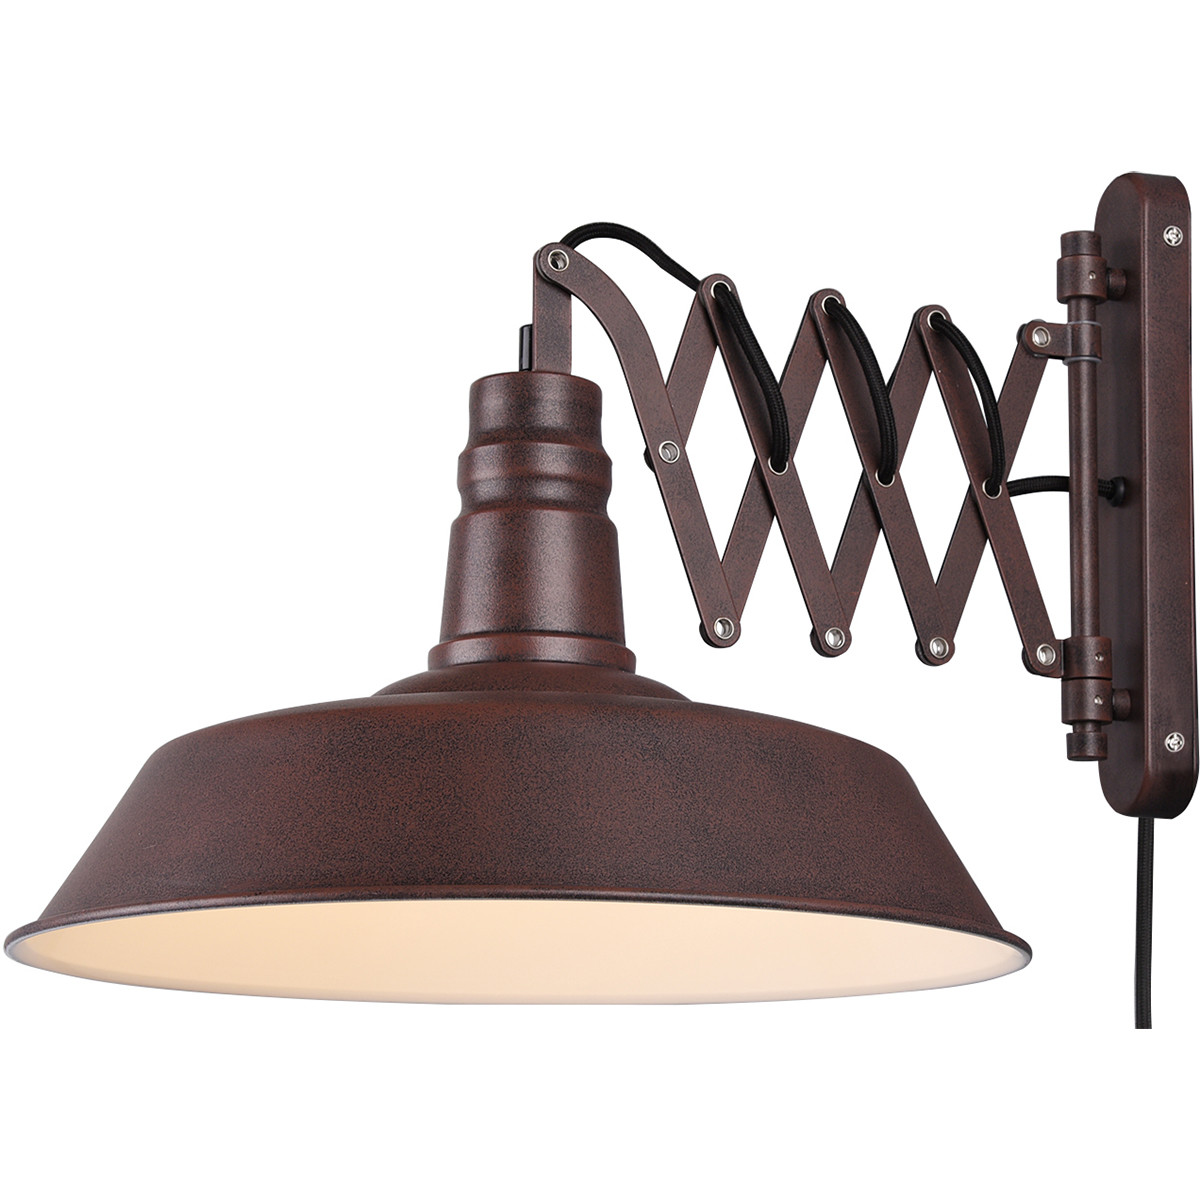 LED Wandlamp - Wandverlichting - Trion Detrino - E27 Fitting - Rond - Roestkleur - Aluminium